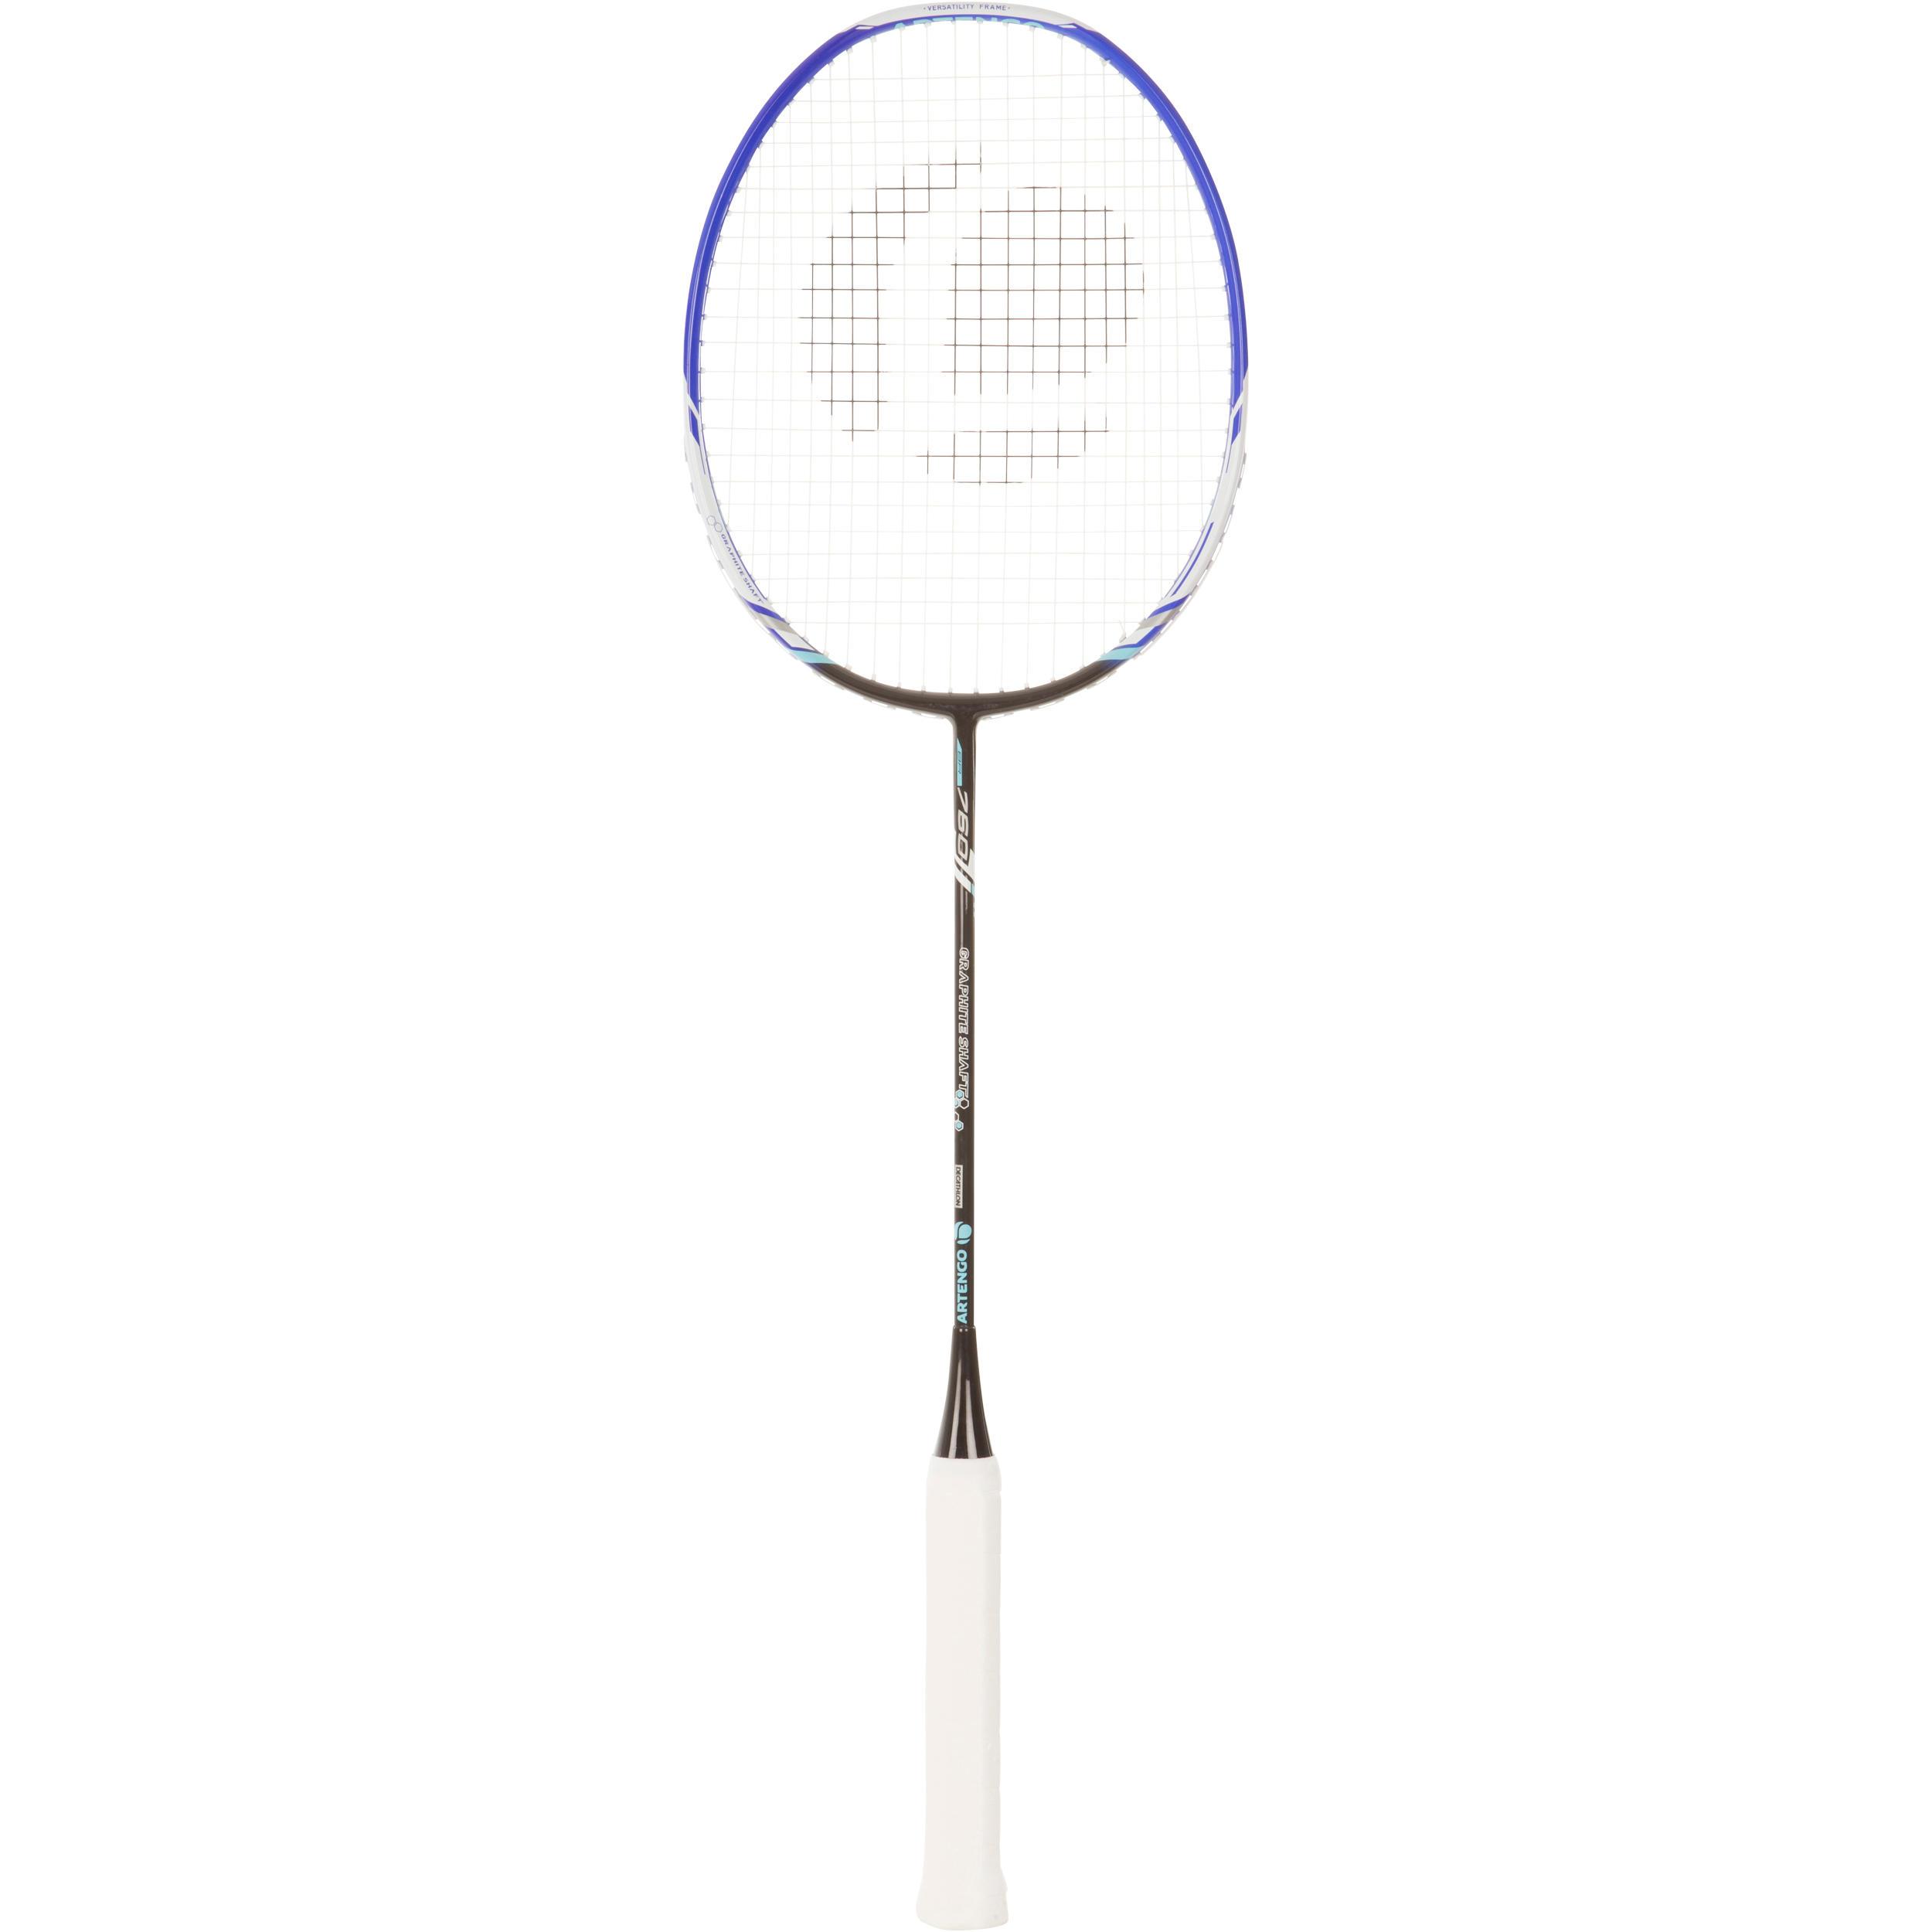 BR760 Adult Badminton Racket - Black/Blue